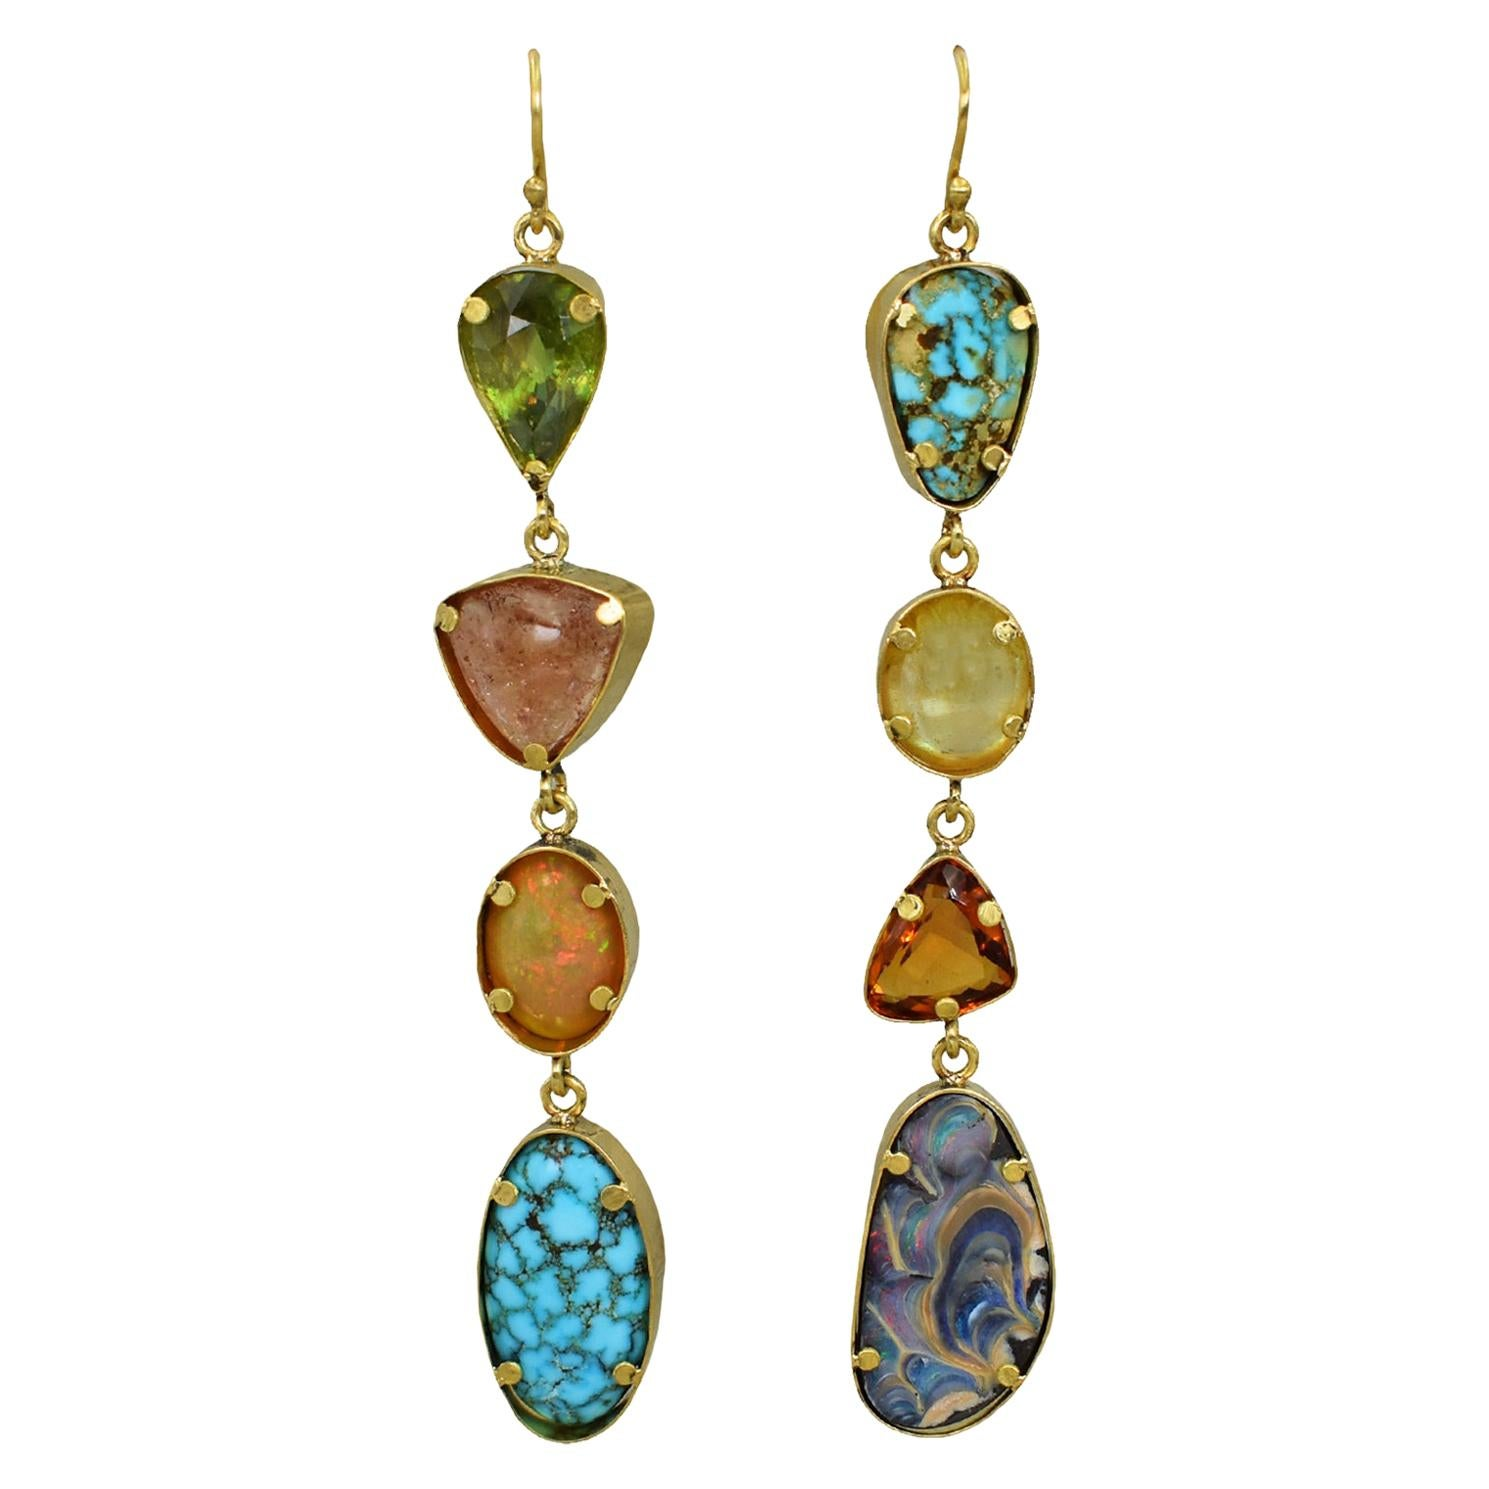 Tourmaline, Turquoise, Opal and Citrine Multi-Gemstone 22k Gold Dangle Earrings